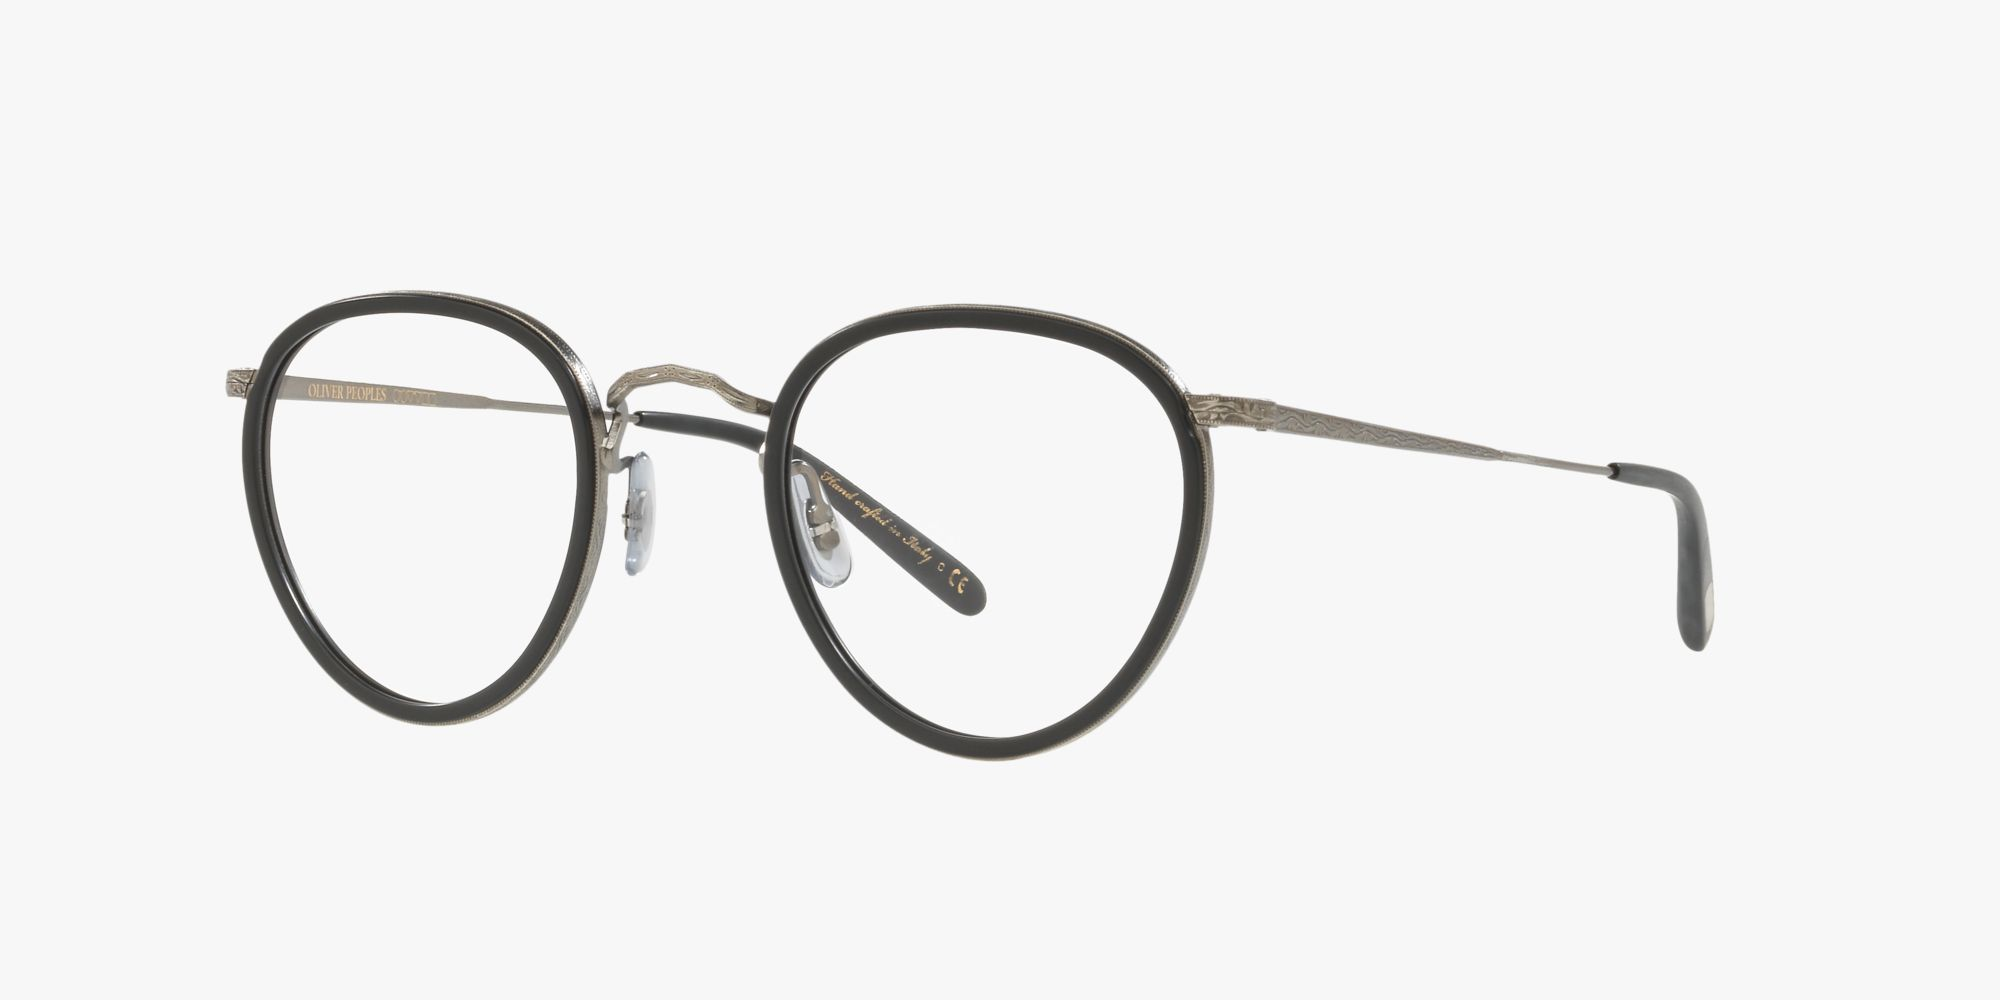 Icons OV1104 - Semi-matte Black/antique Pewter - Demo Gläser ...